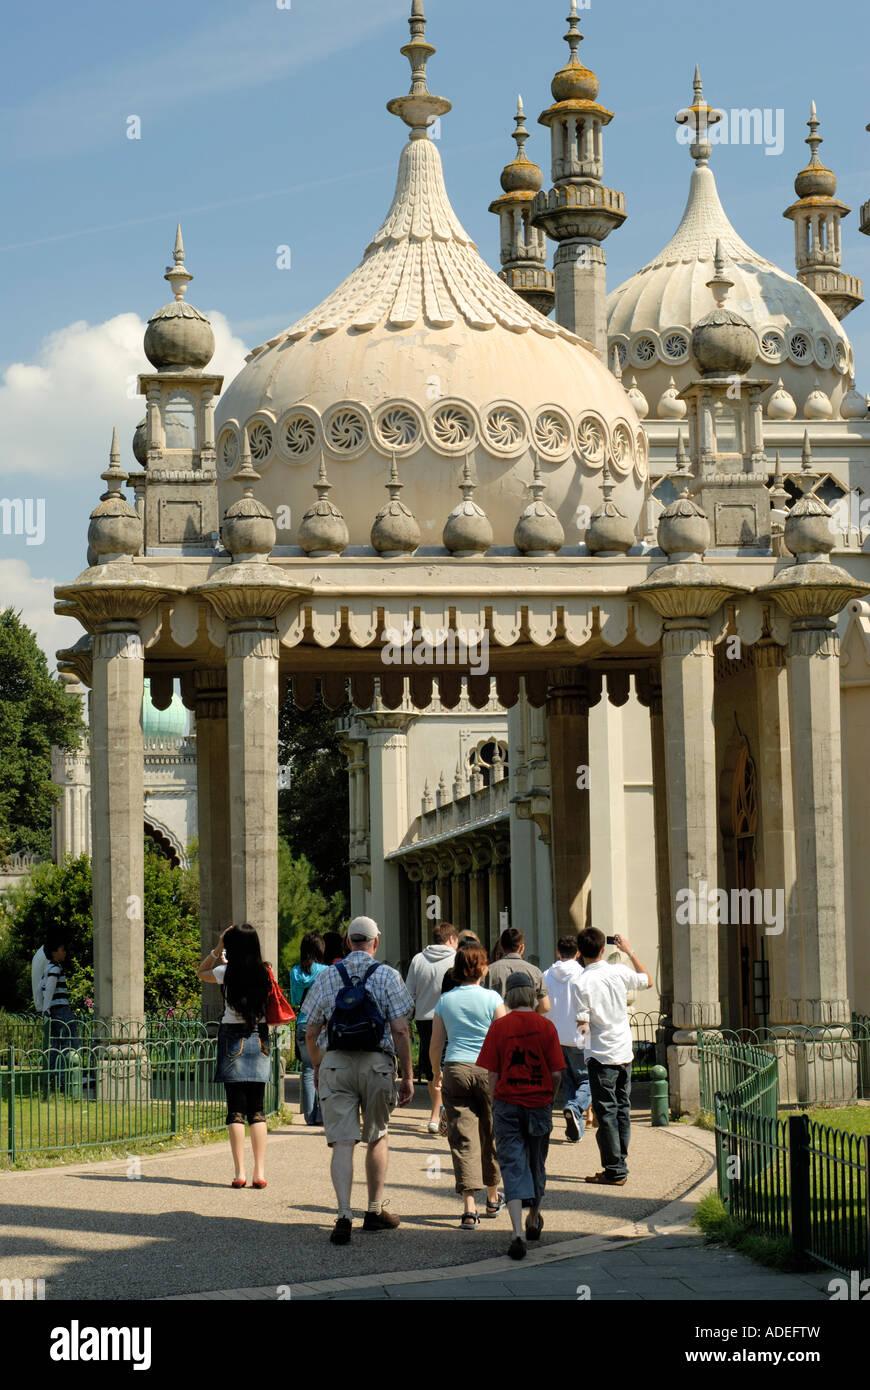 Brighton, the Royal Pavilion. Regent's Palace. Visitors entering front entrance. Stock Photo